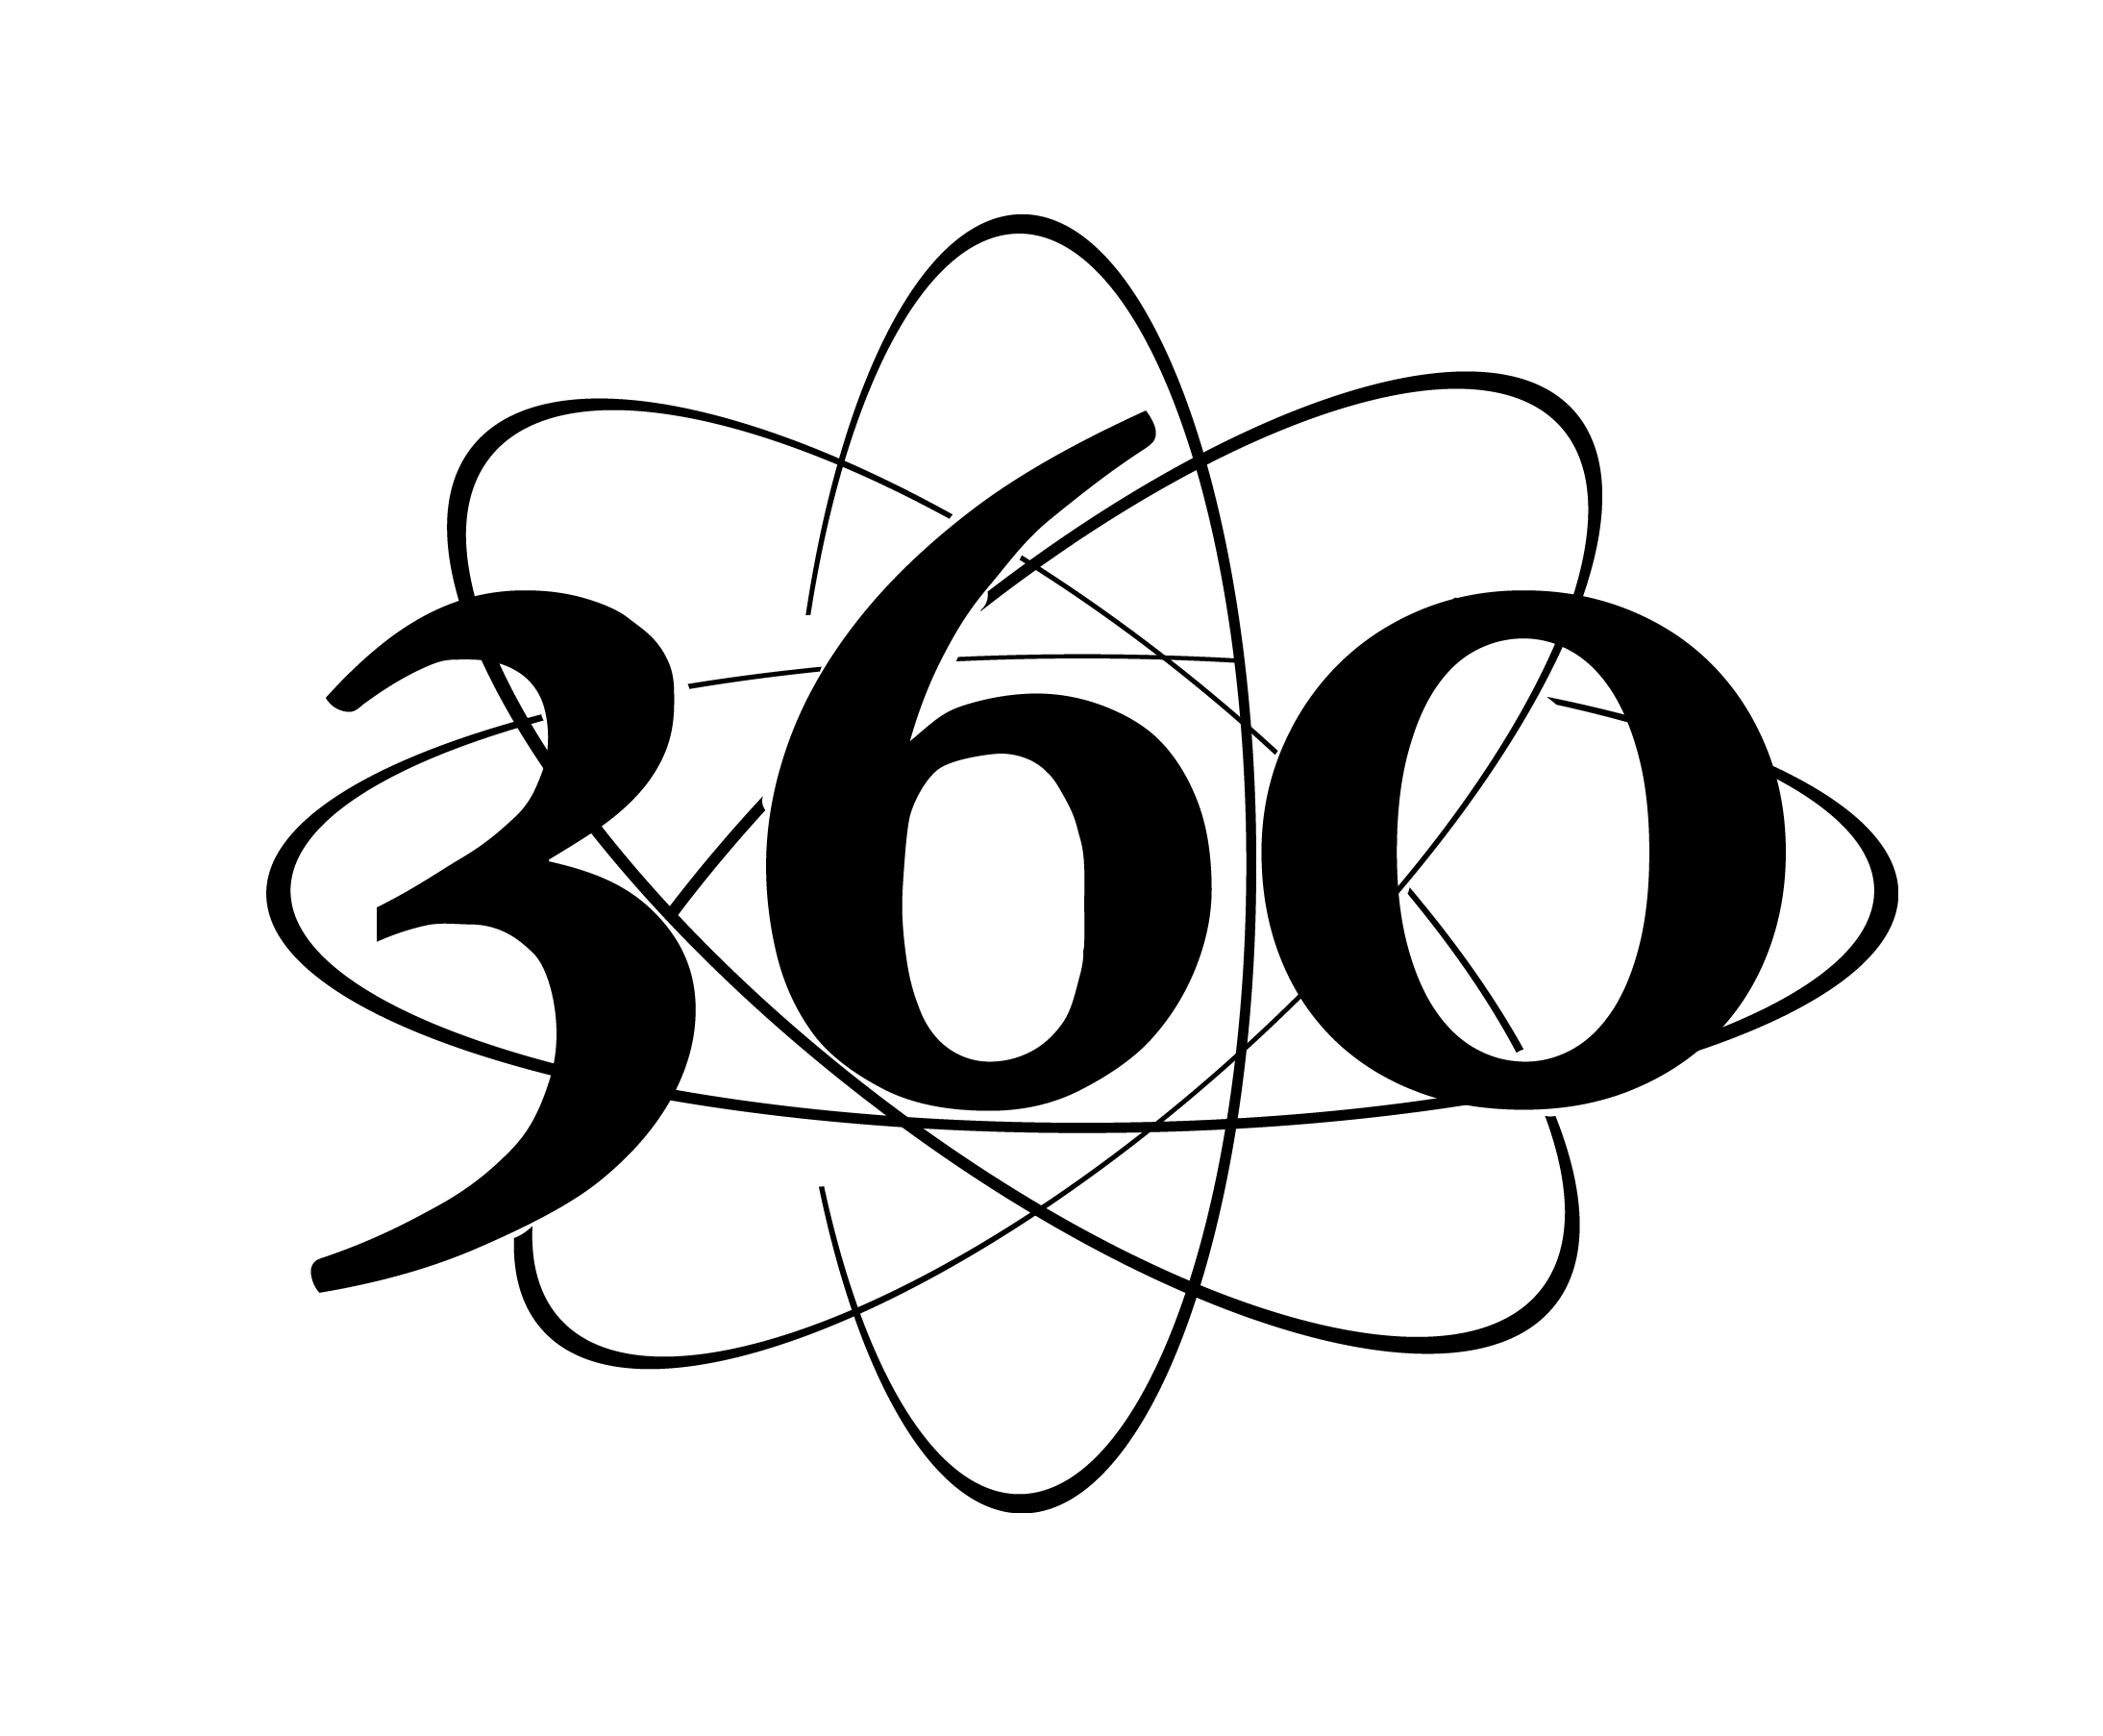 Web Vision 360